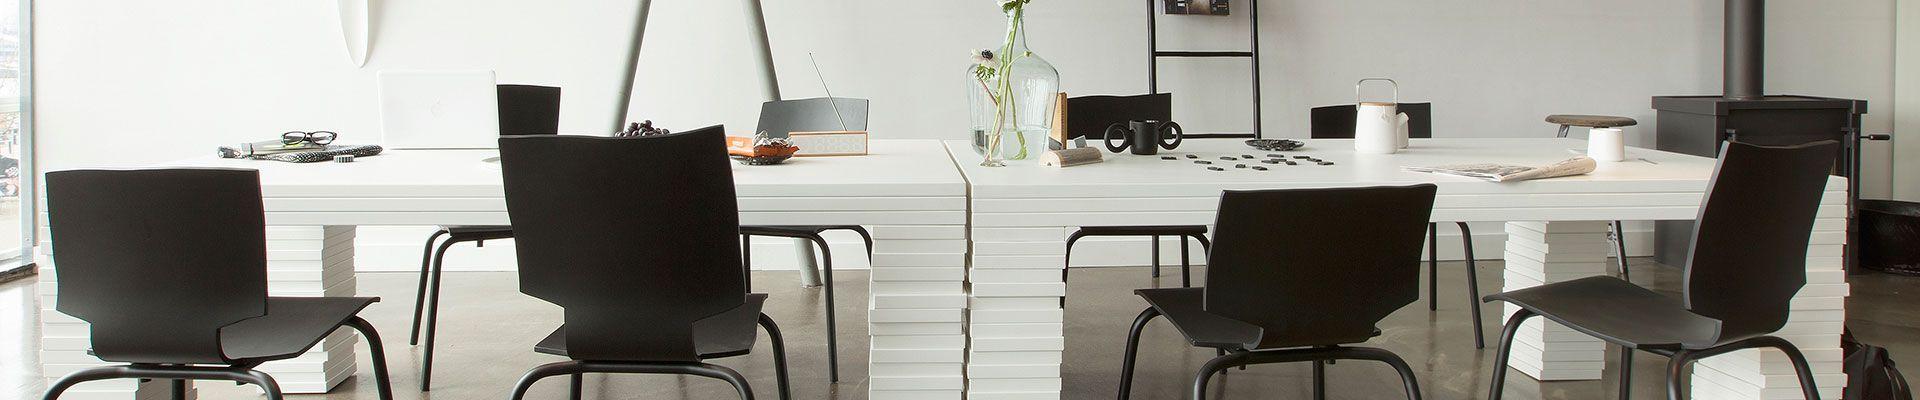 Gispen tafels